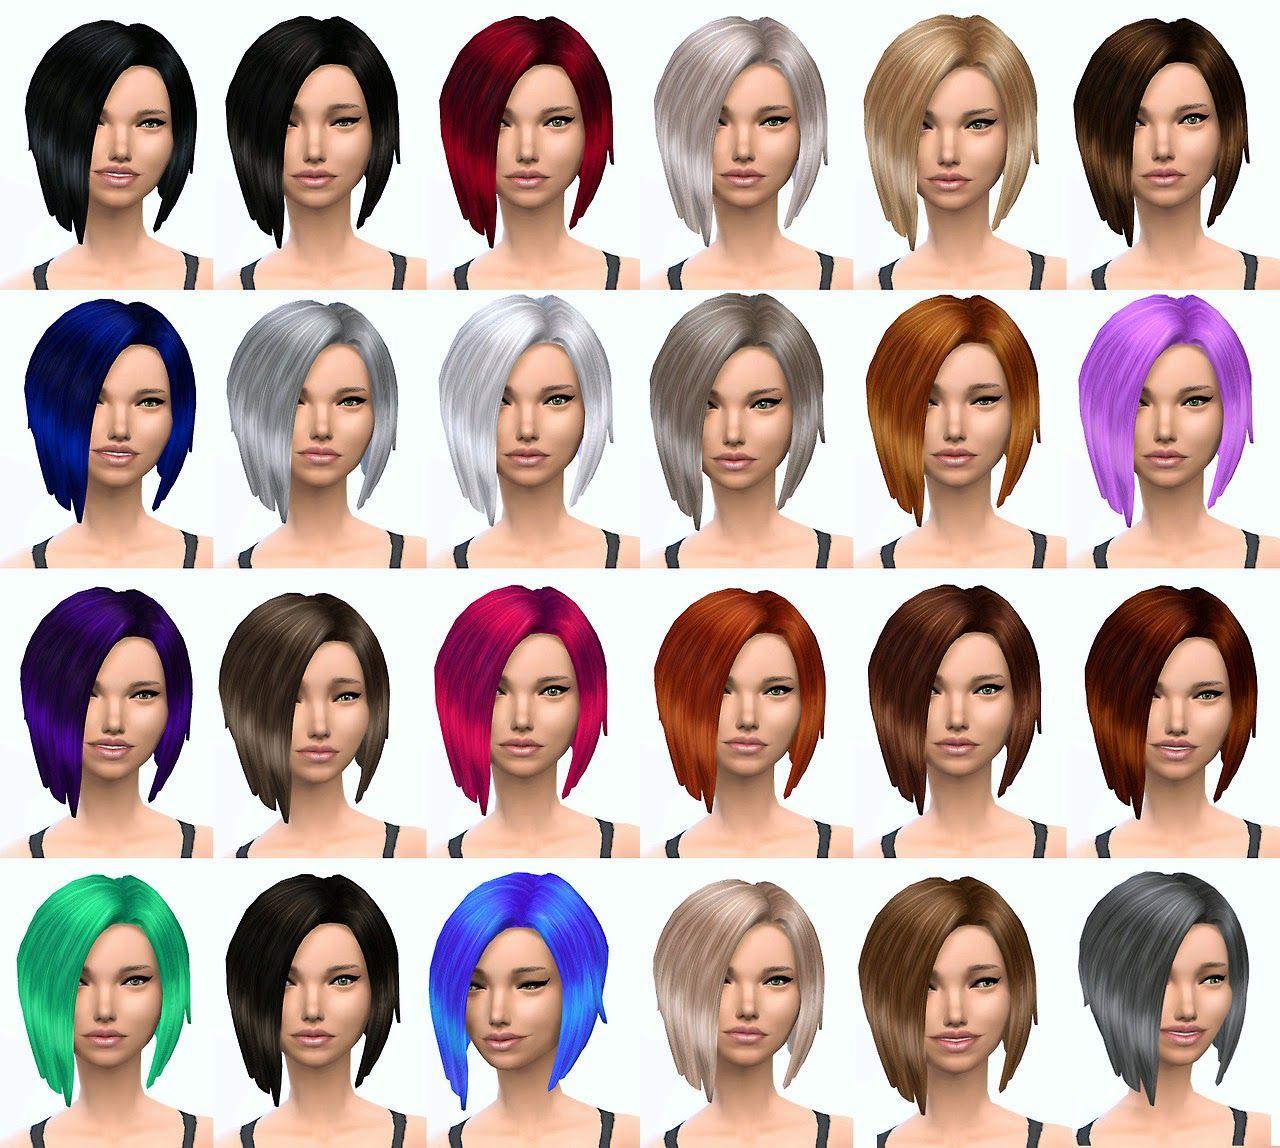 24 default hair retextures